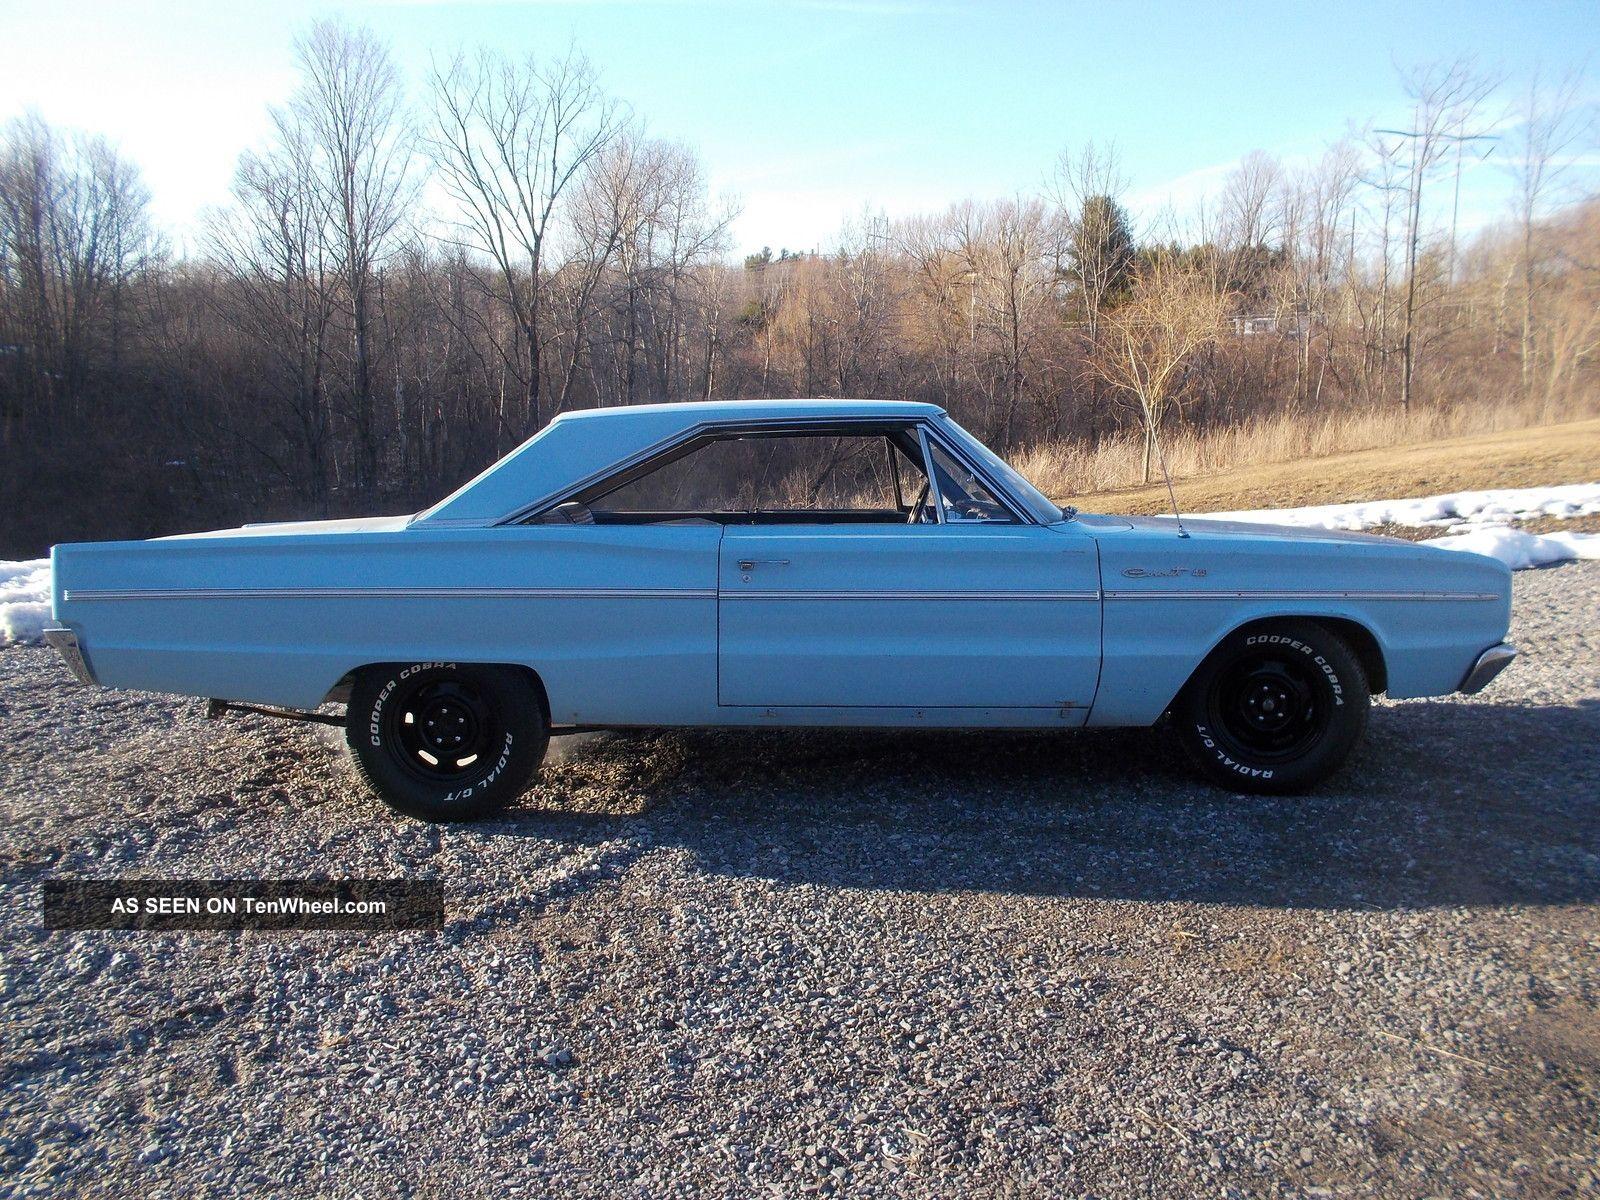 1966 Dodge Coronet 440 - 2 Door Hardtop - Hemi Mufflers: Coronet photo